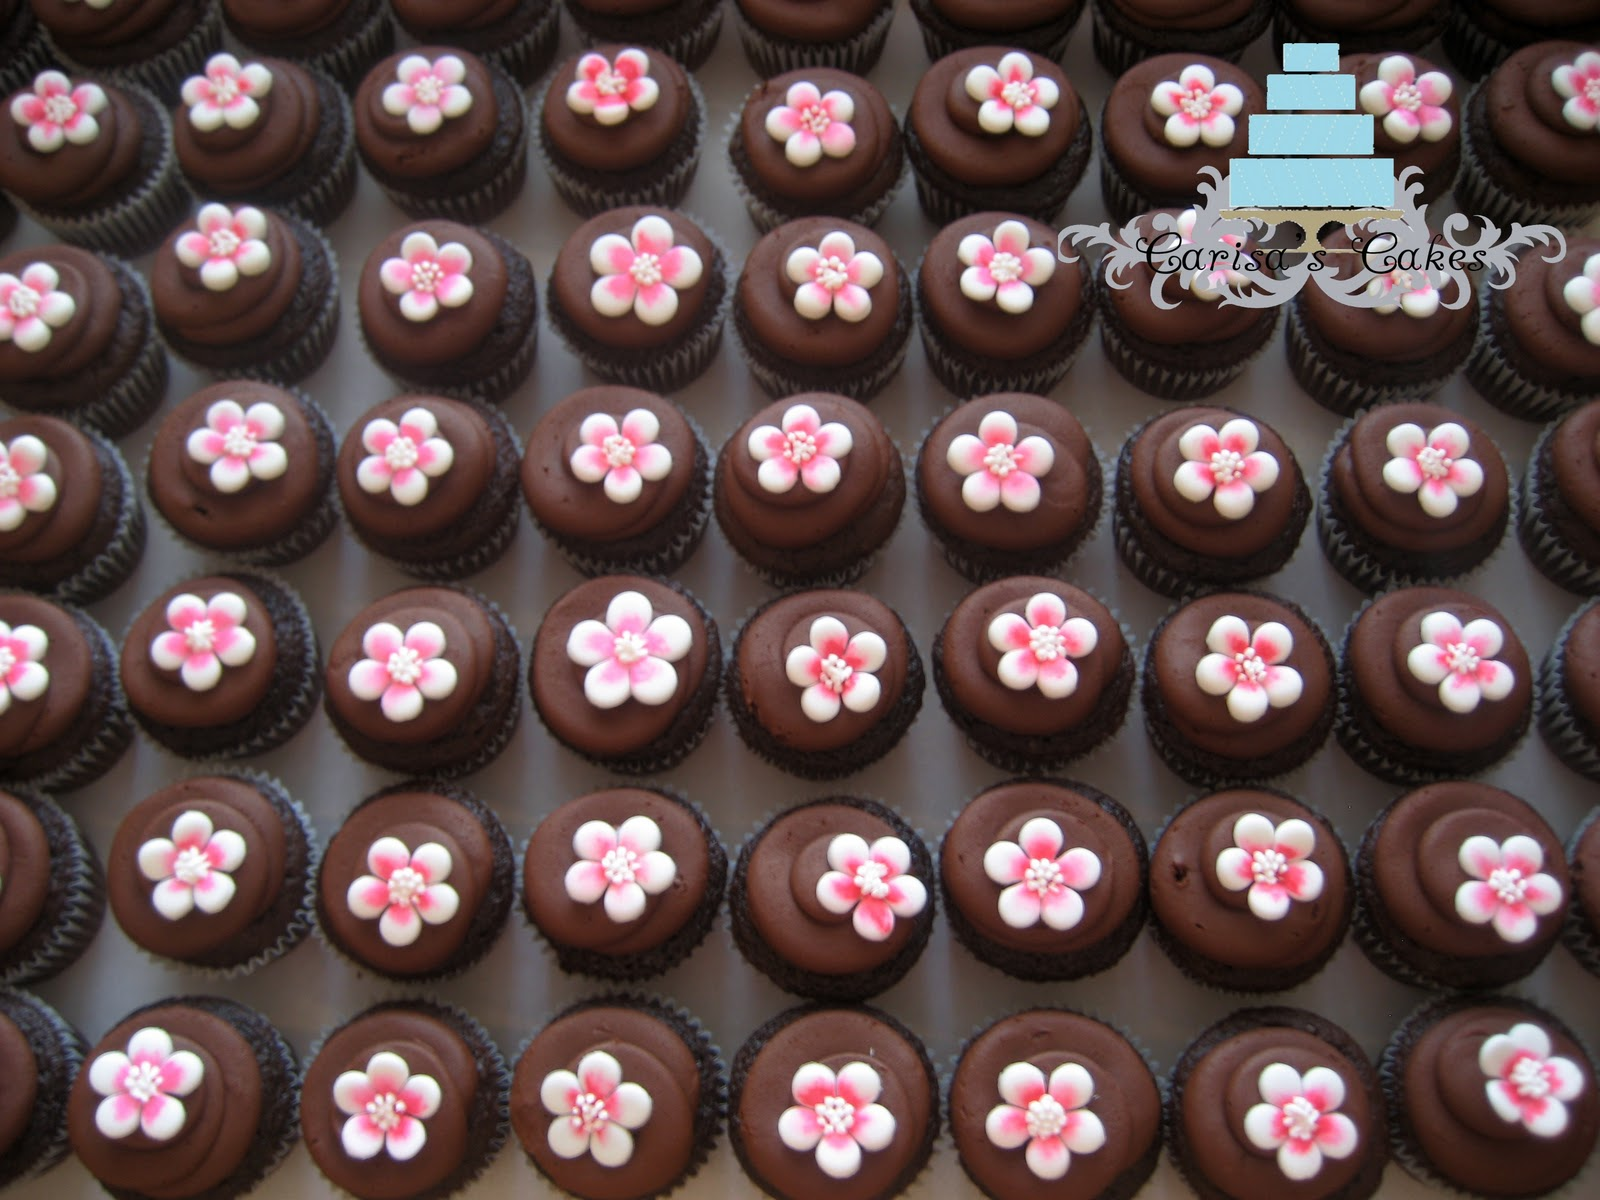 Carisa s Cakes Cherry Blossom Cake & Cupcakes